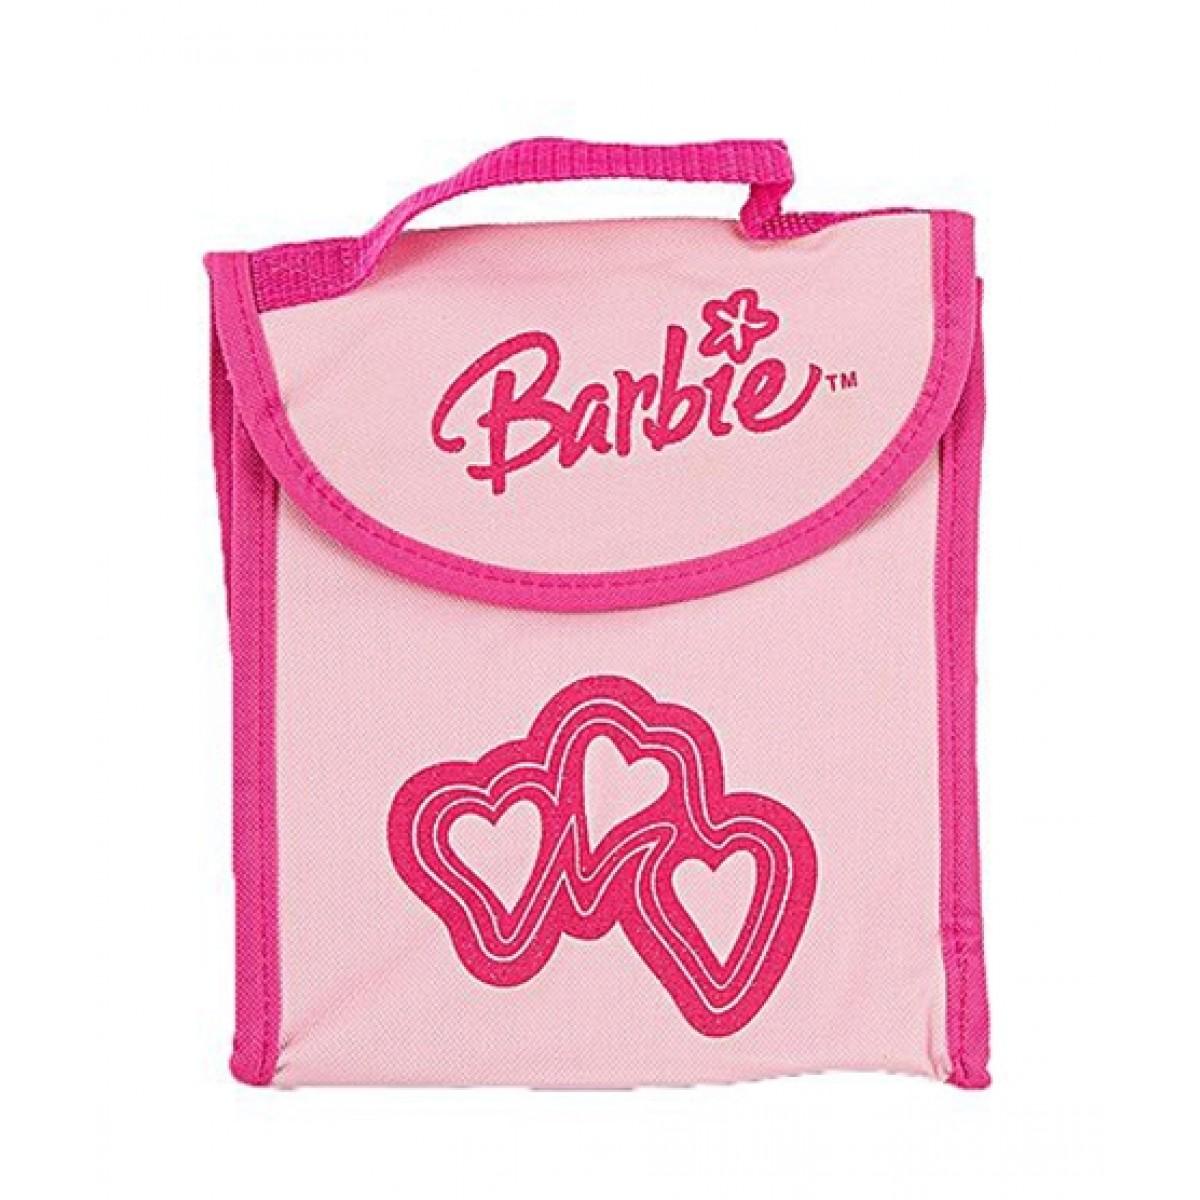 Asaan Buy Single And Double Handle Barbie School Bag - Pink (TO-0022)